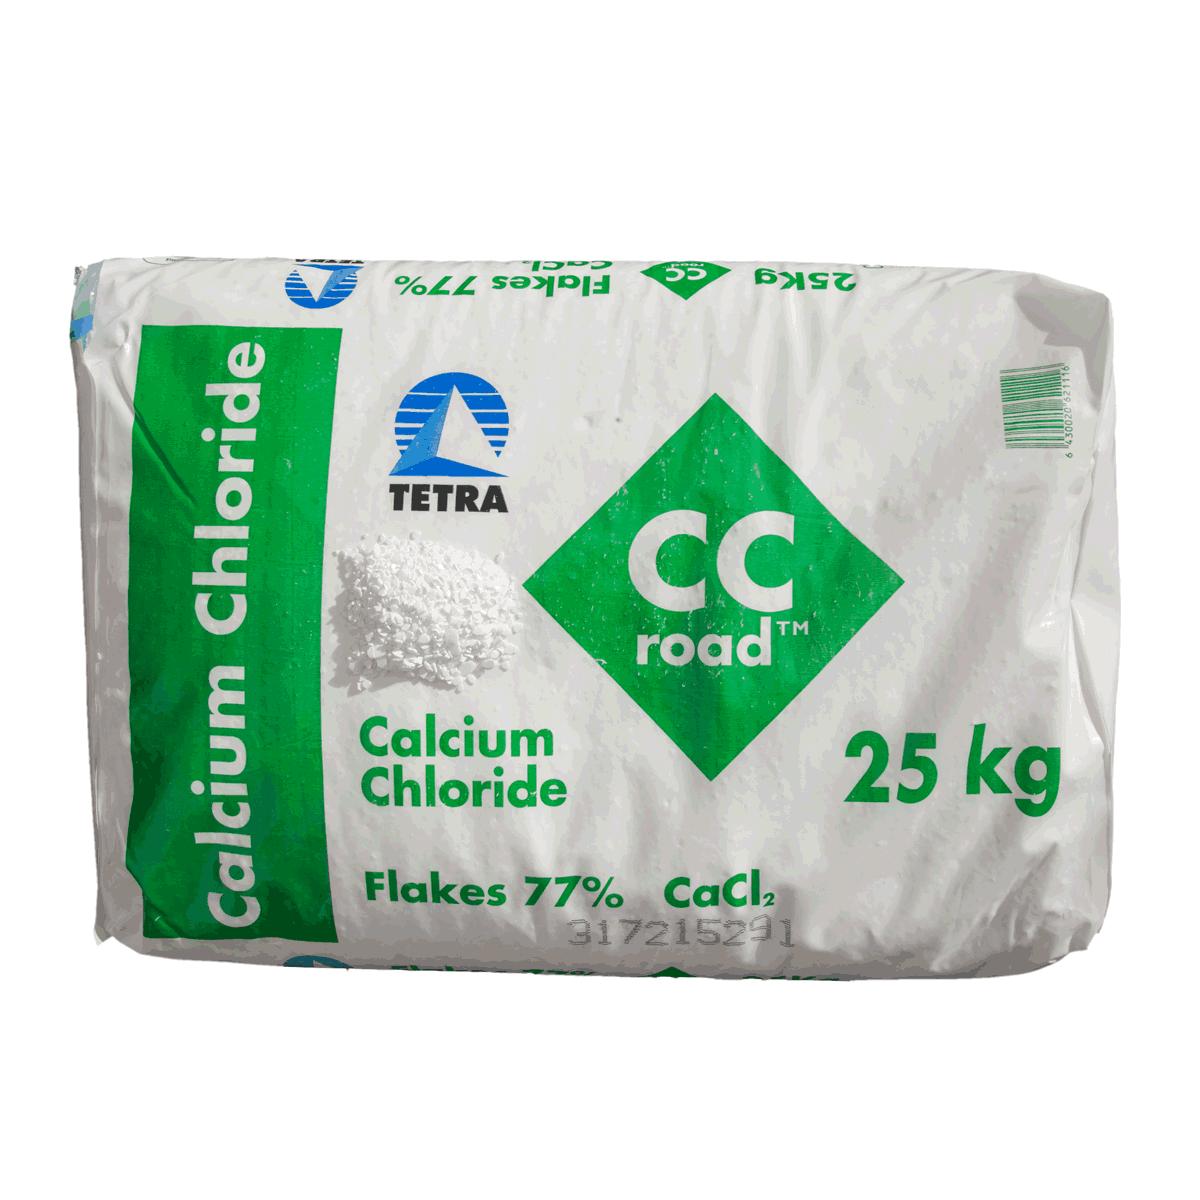 hochergiebiges calciumchlorid streugranulat h fer chemie. Black Bedroom Furniture Sets. Home Design Ideas